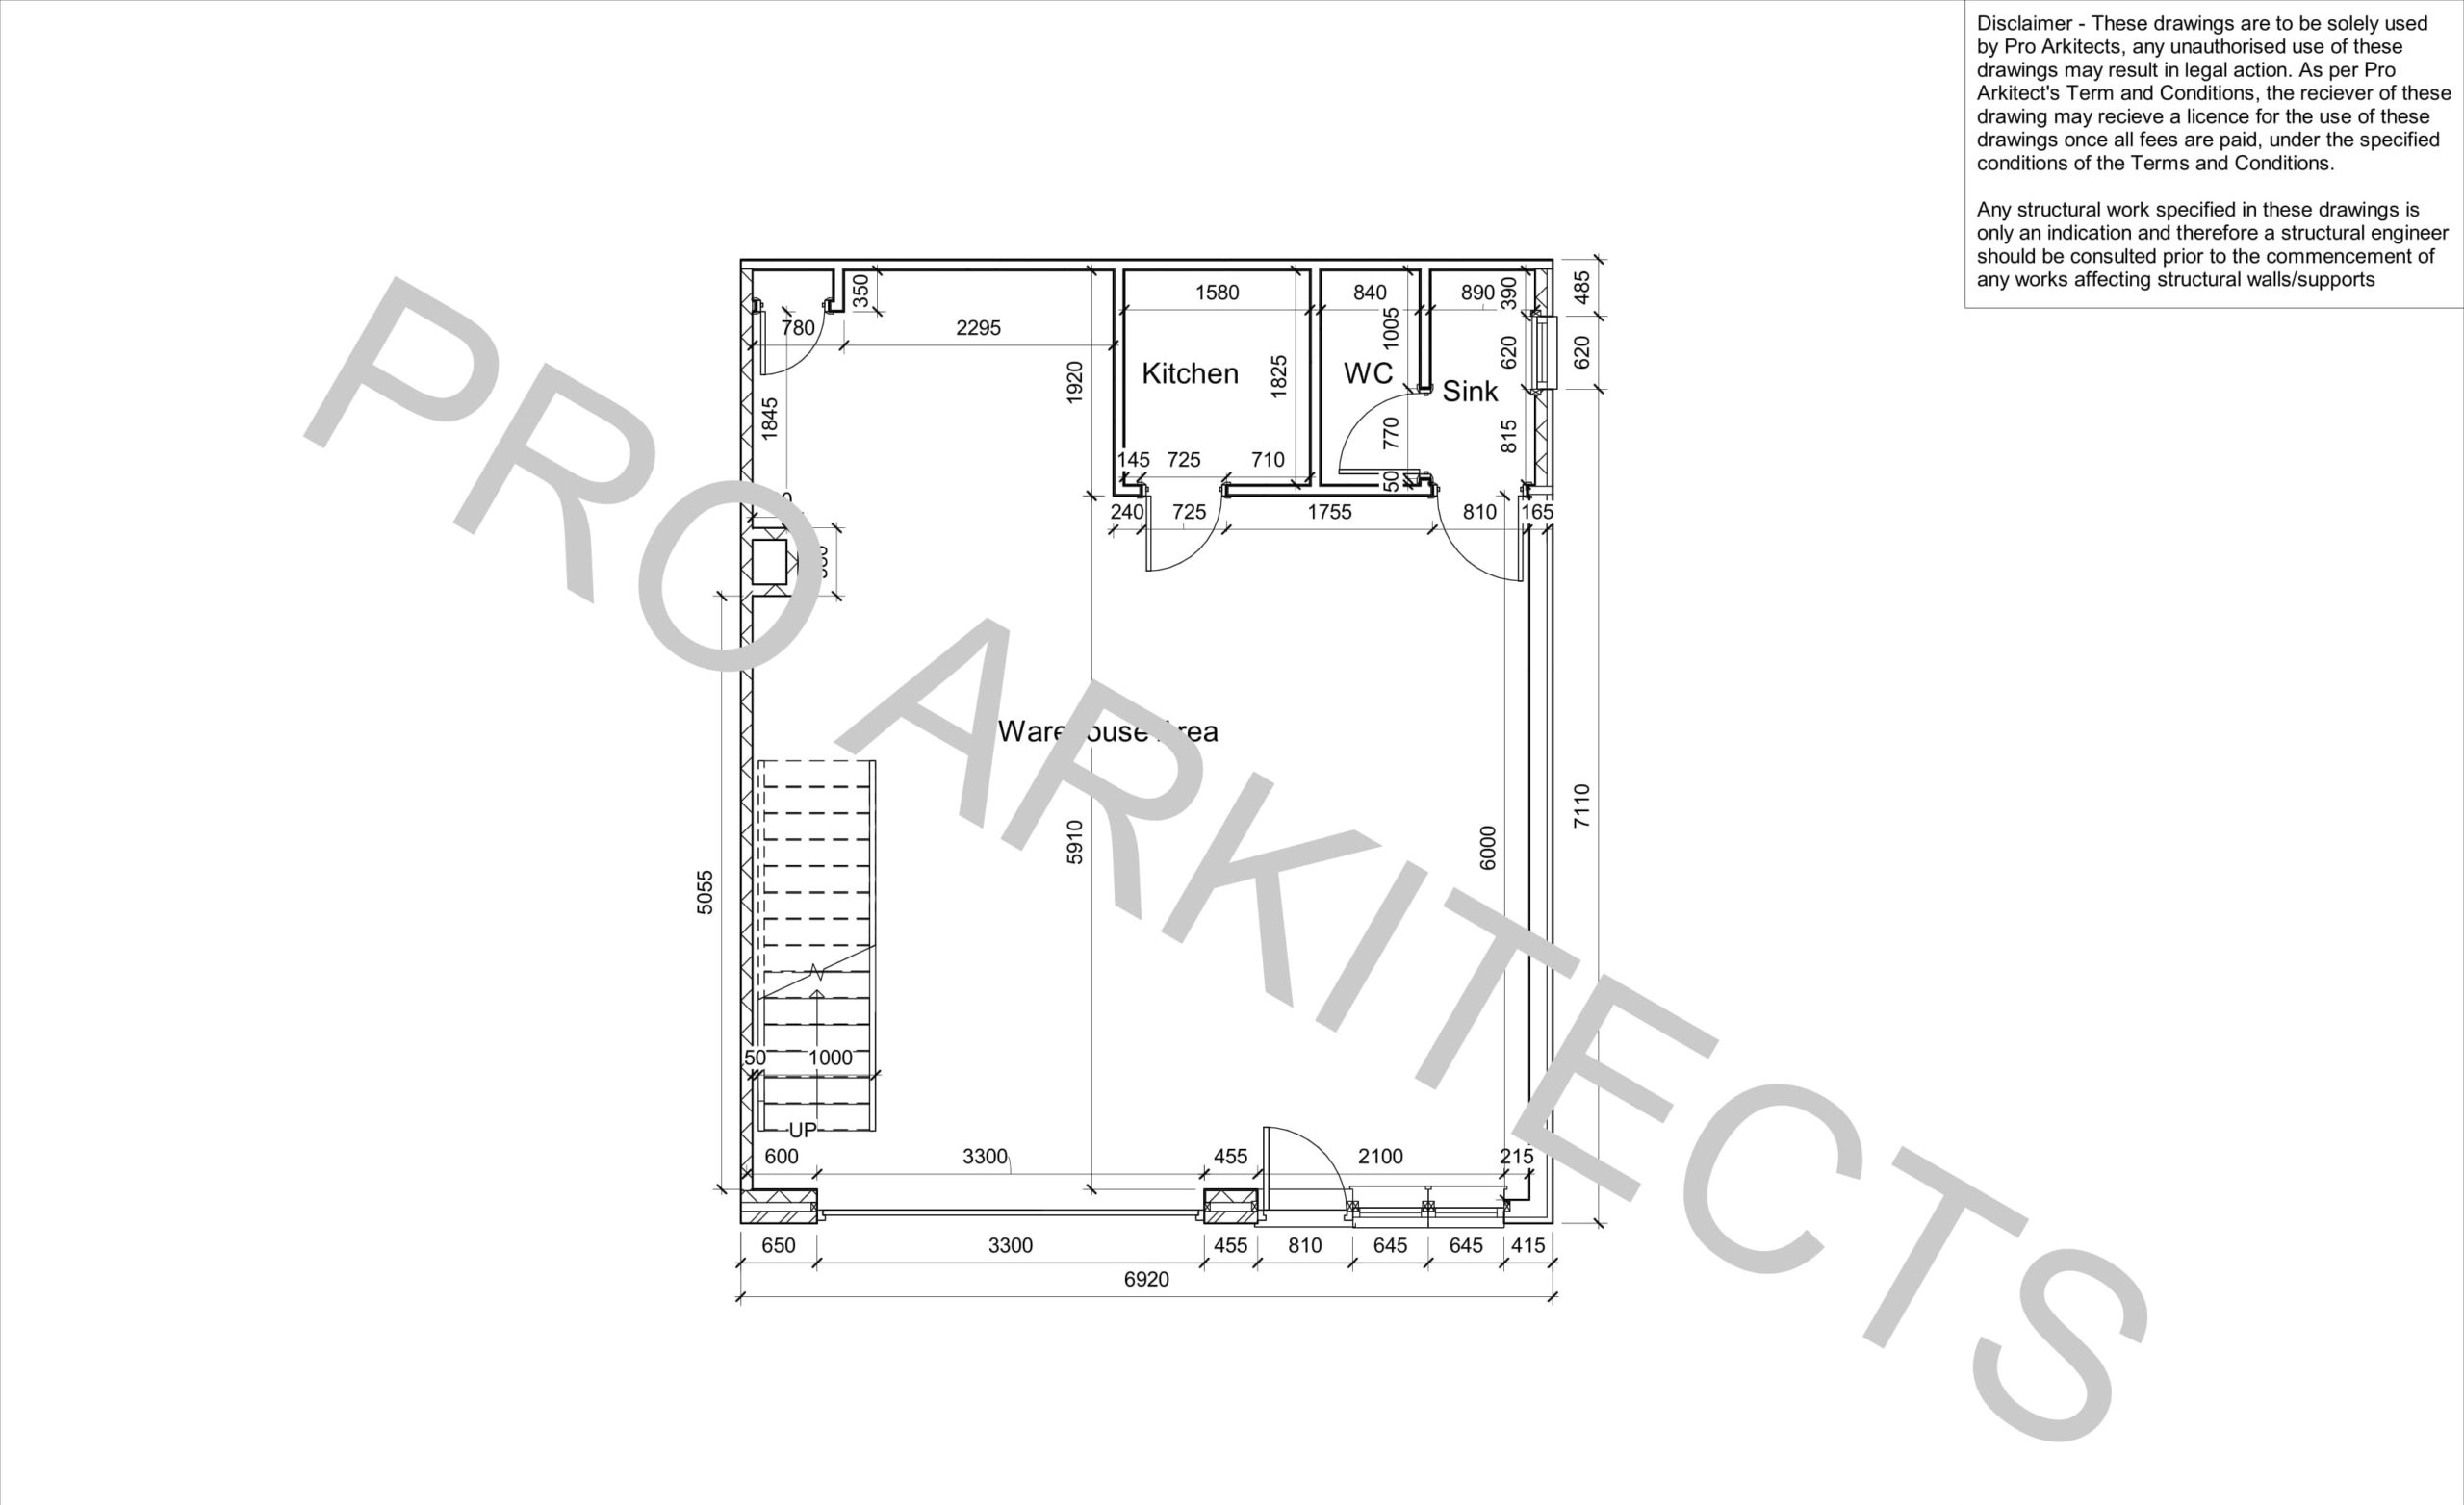 Stafford Close, Ashford – Building Regulations